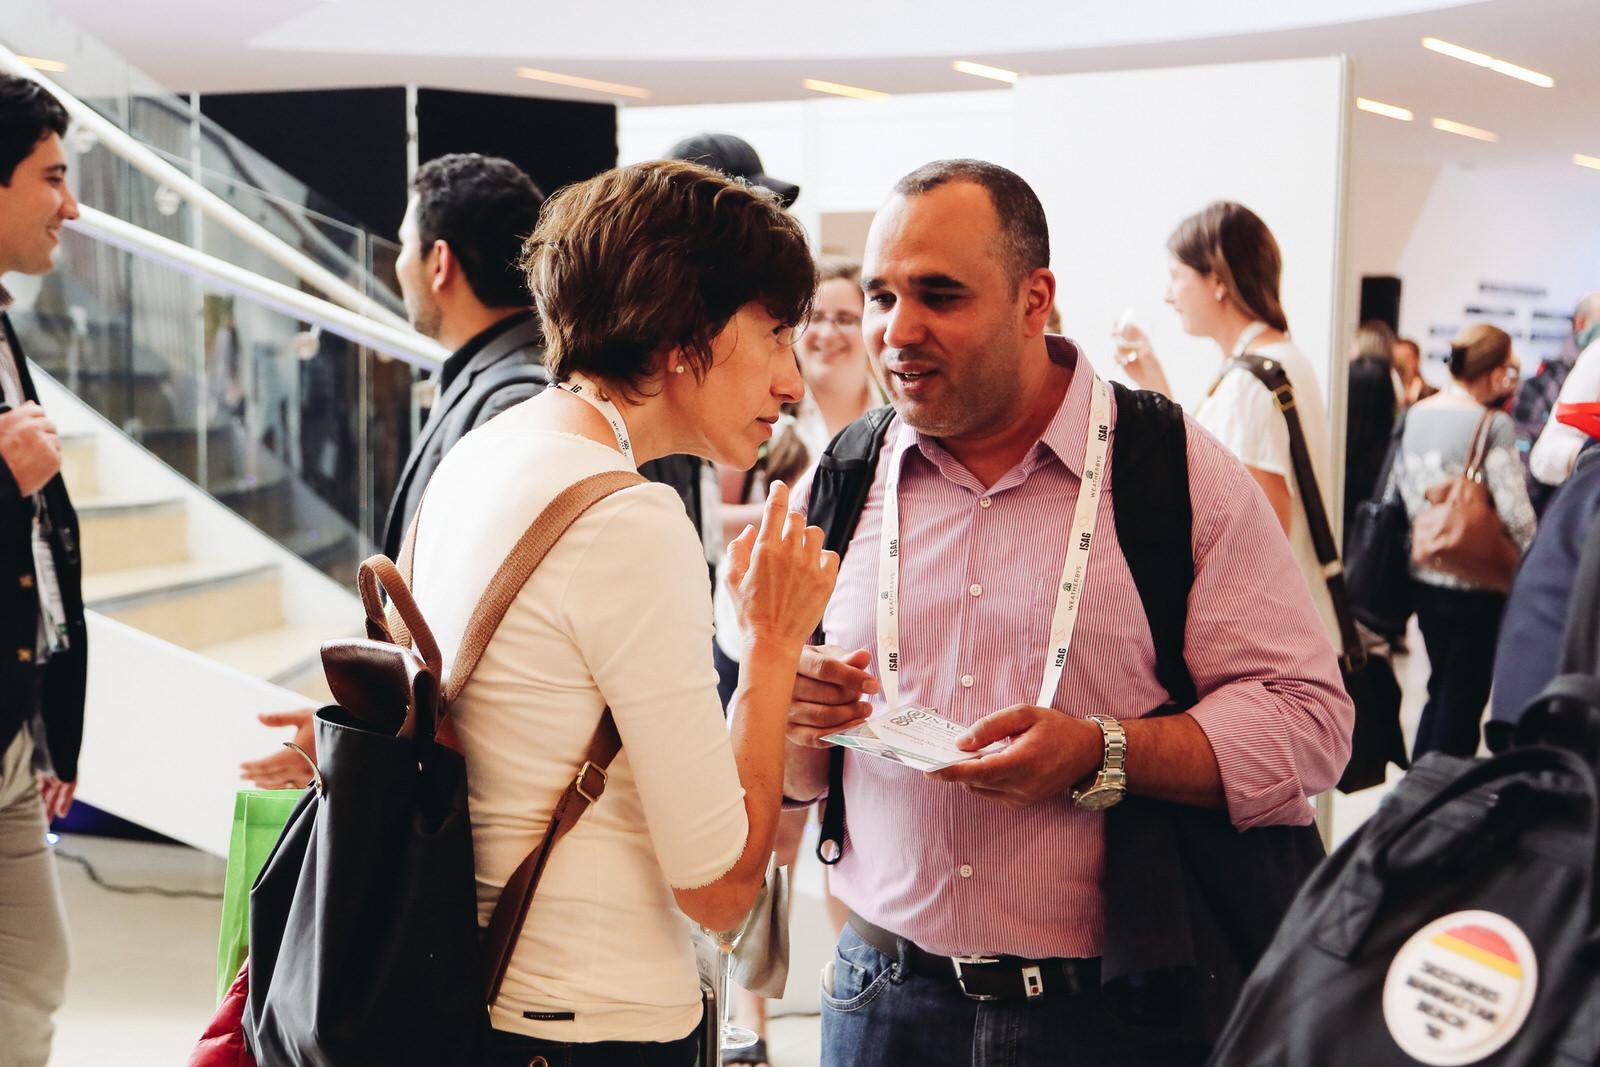 Corporate-conference-photographer-dublin-043.jpg